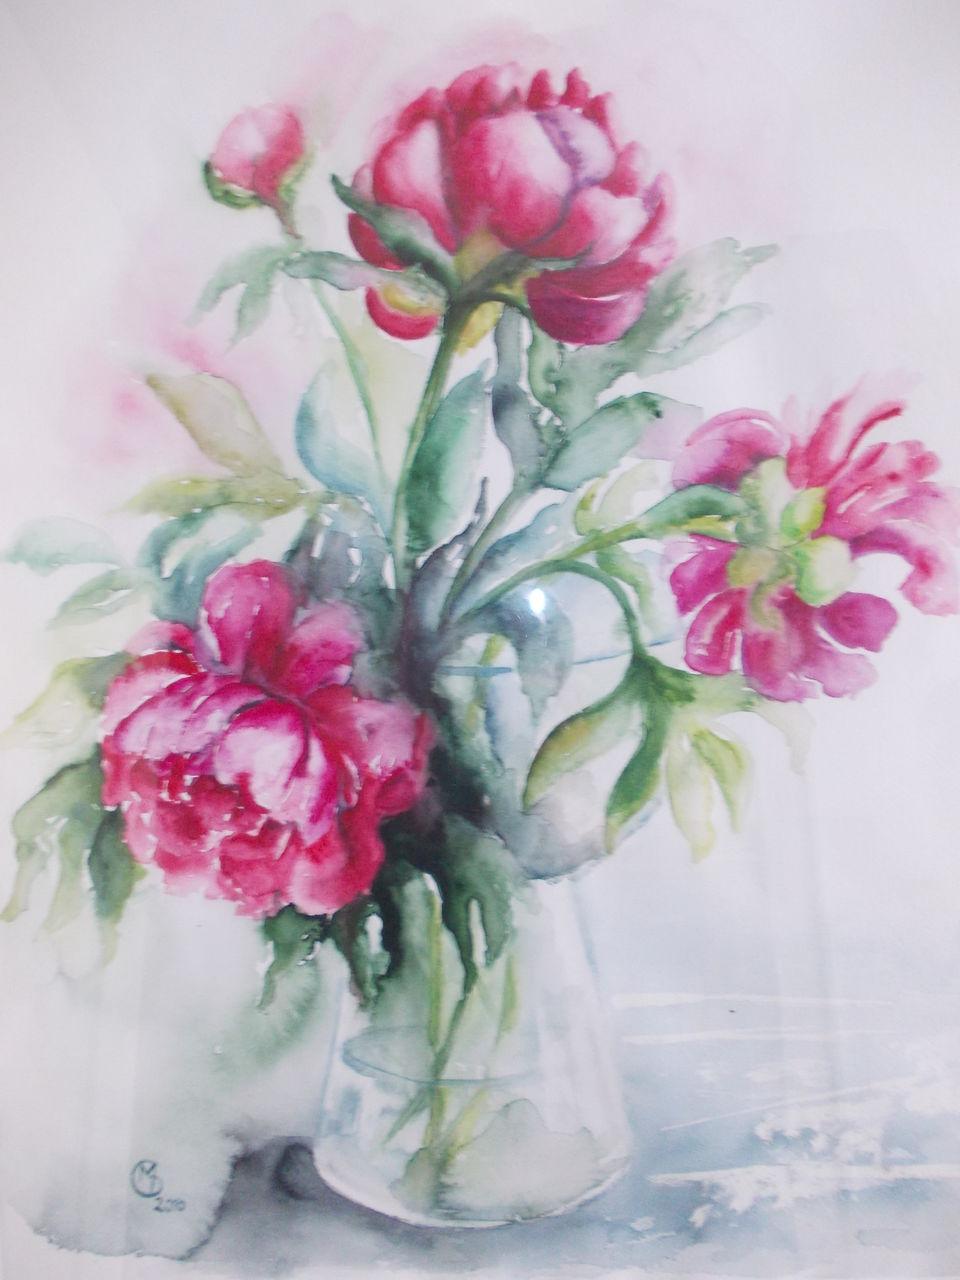 bild vase pfinstrosen aquarell pflanzen von dorothy maurus bei kunstnet. Black Bedroom Furniture Sets. Home Design Ideas